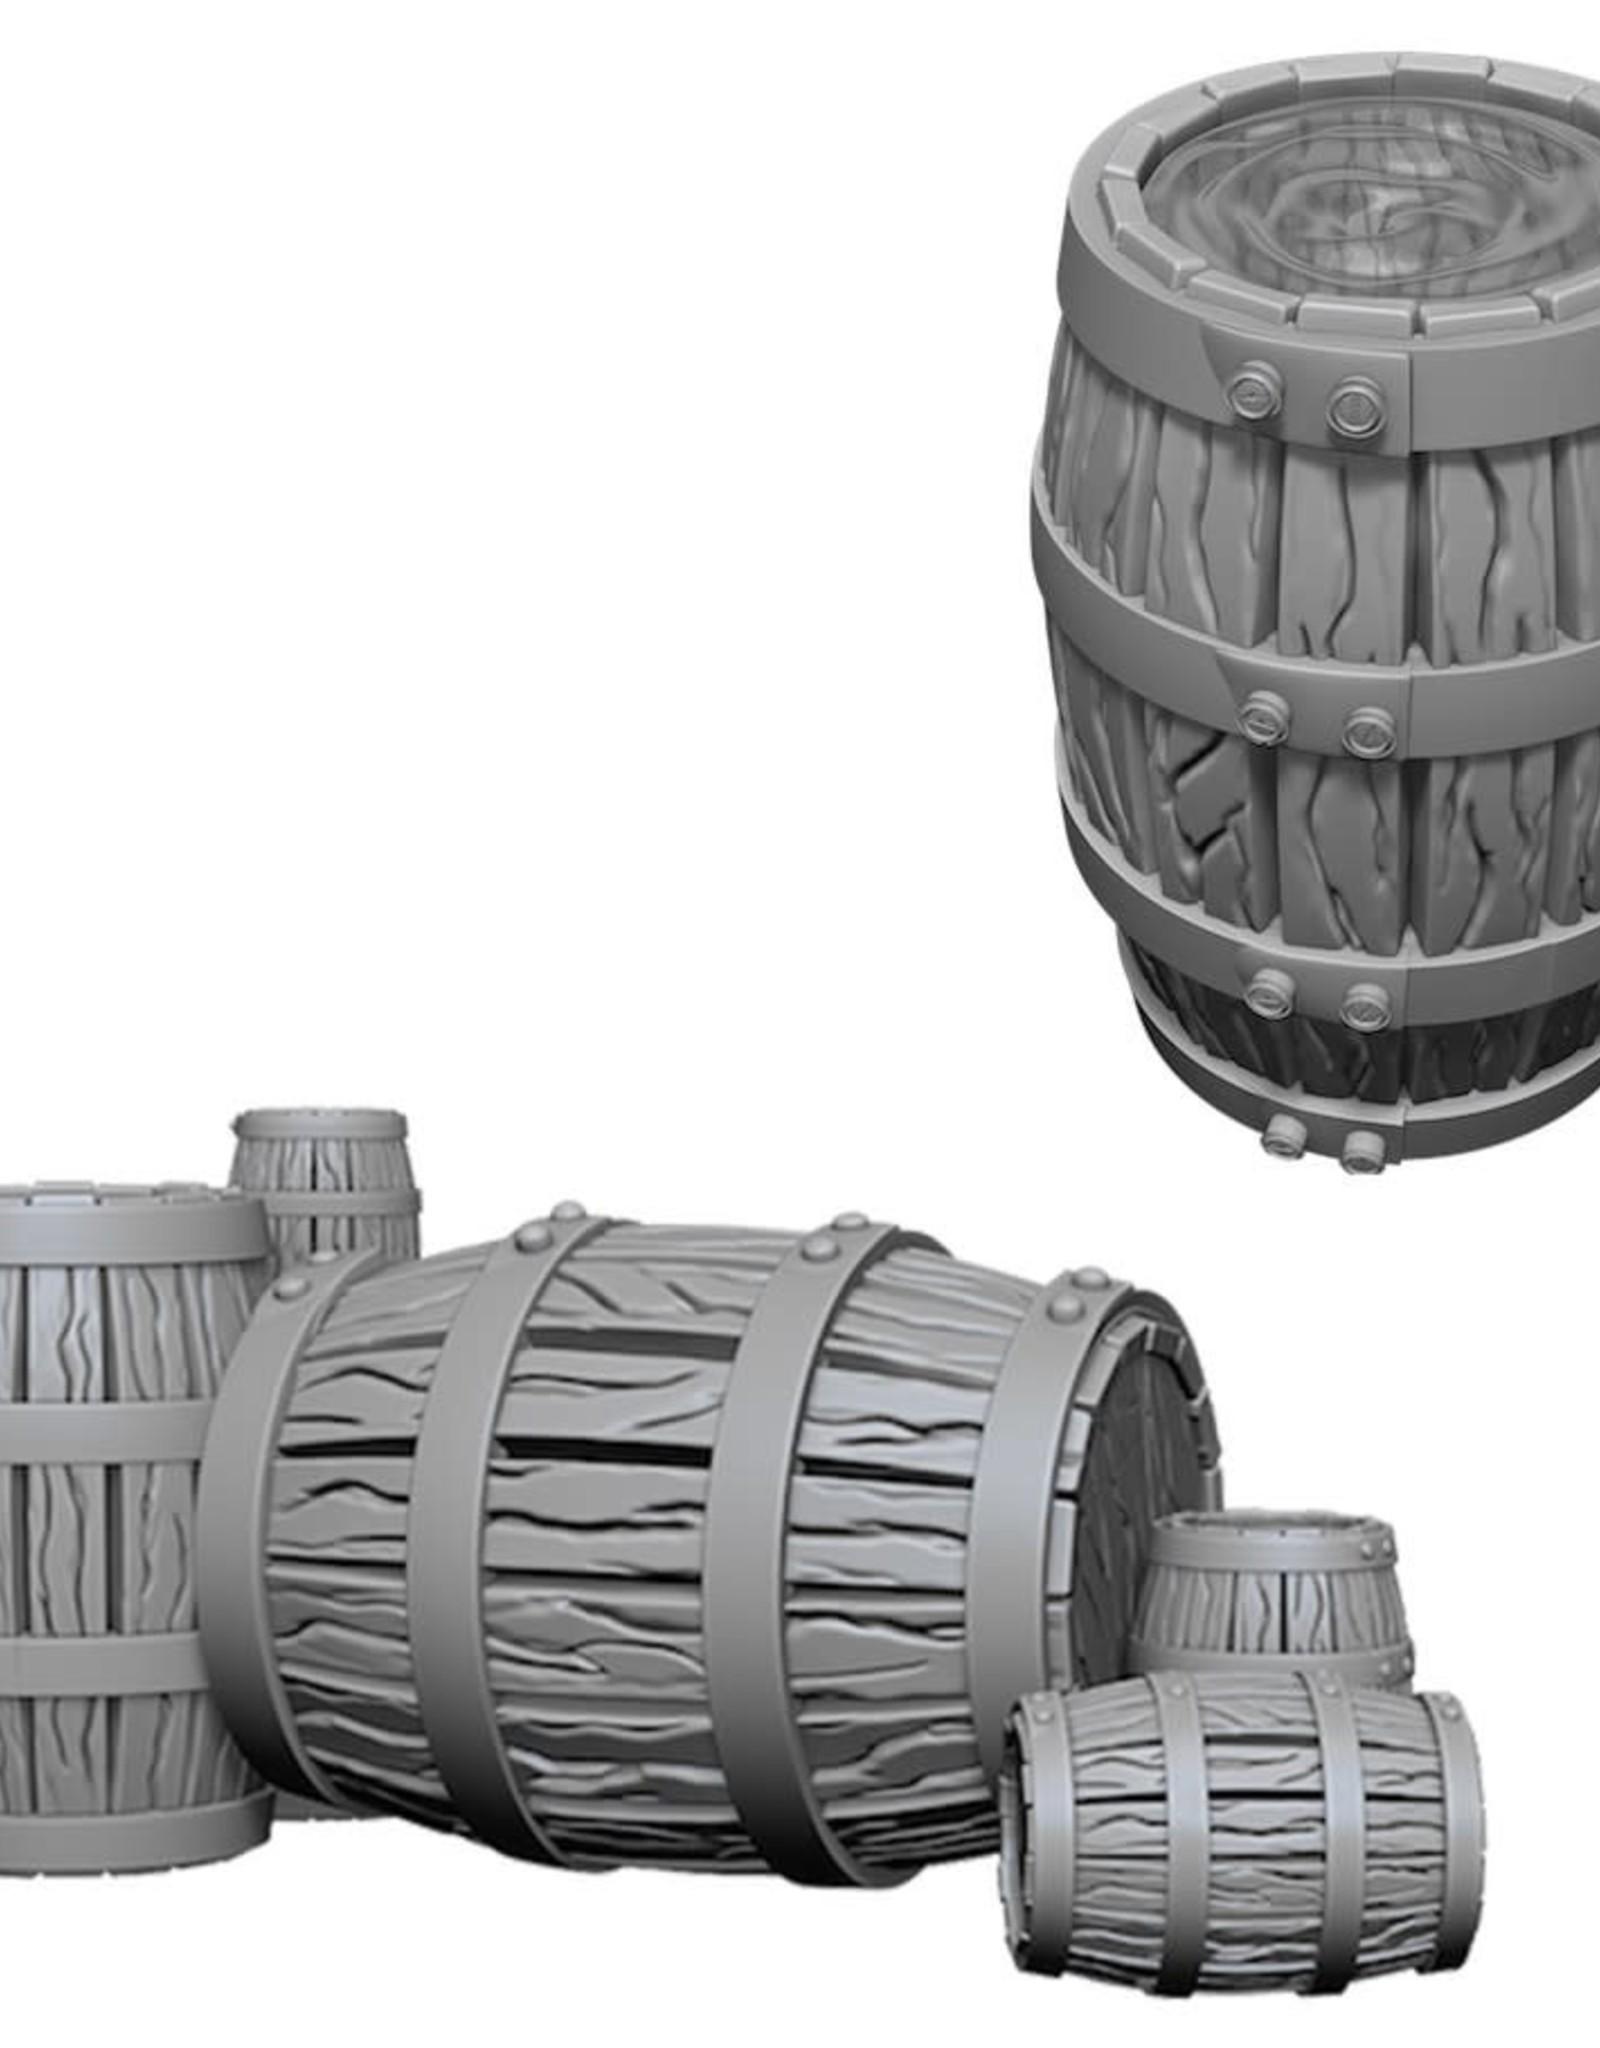 Wizkids Deep Cuts Unpainted Minis: Barrel and Pile of Barrels